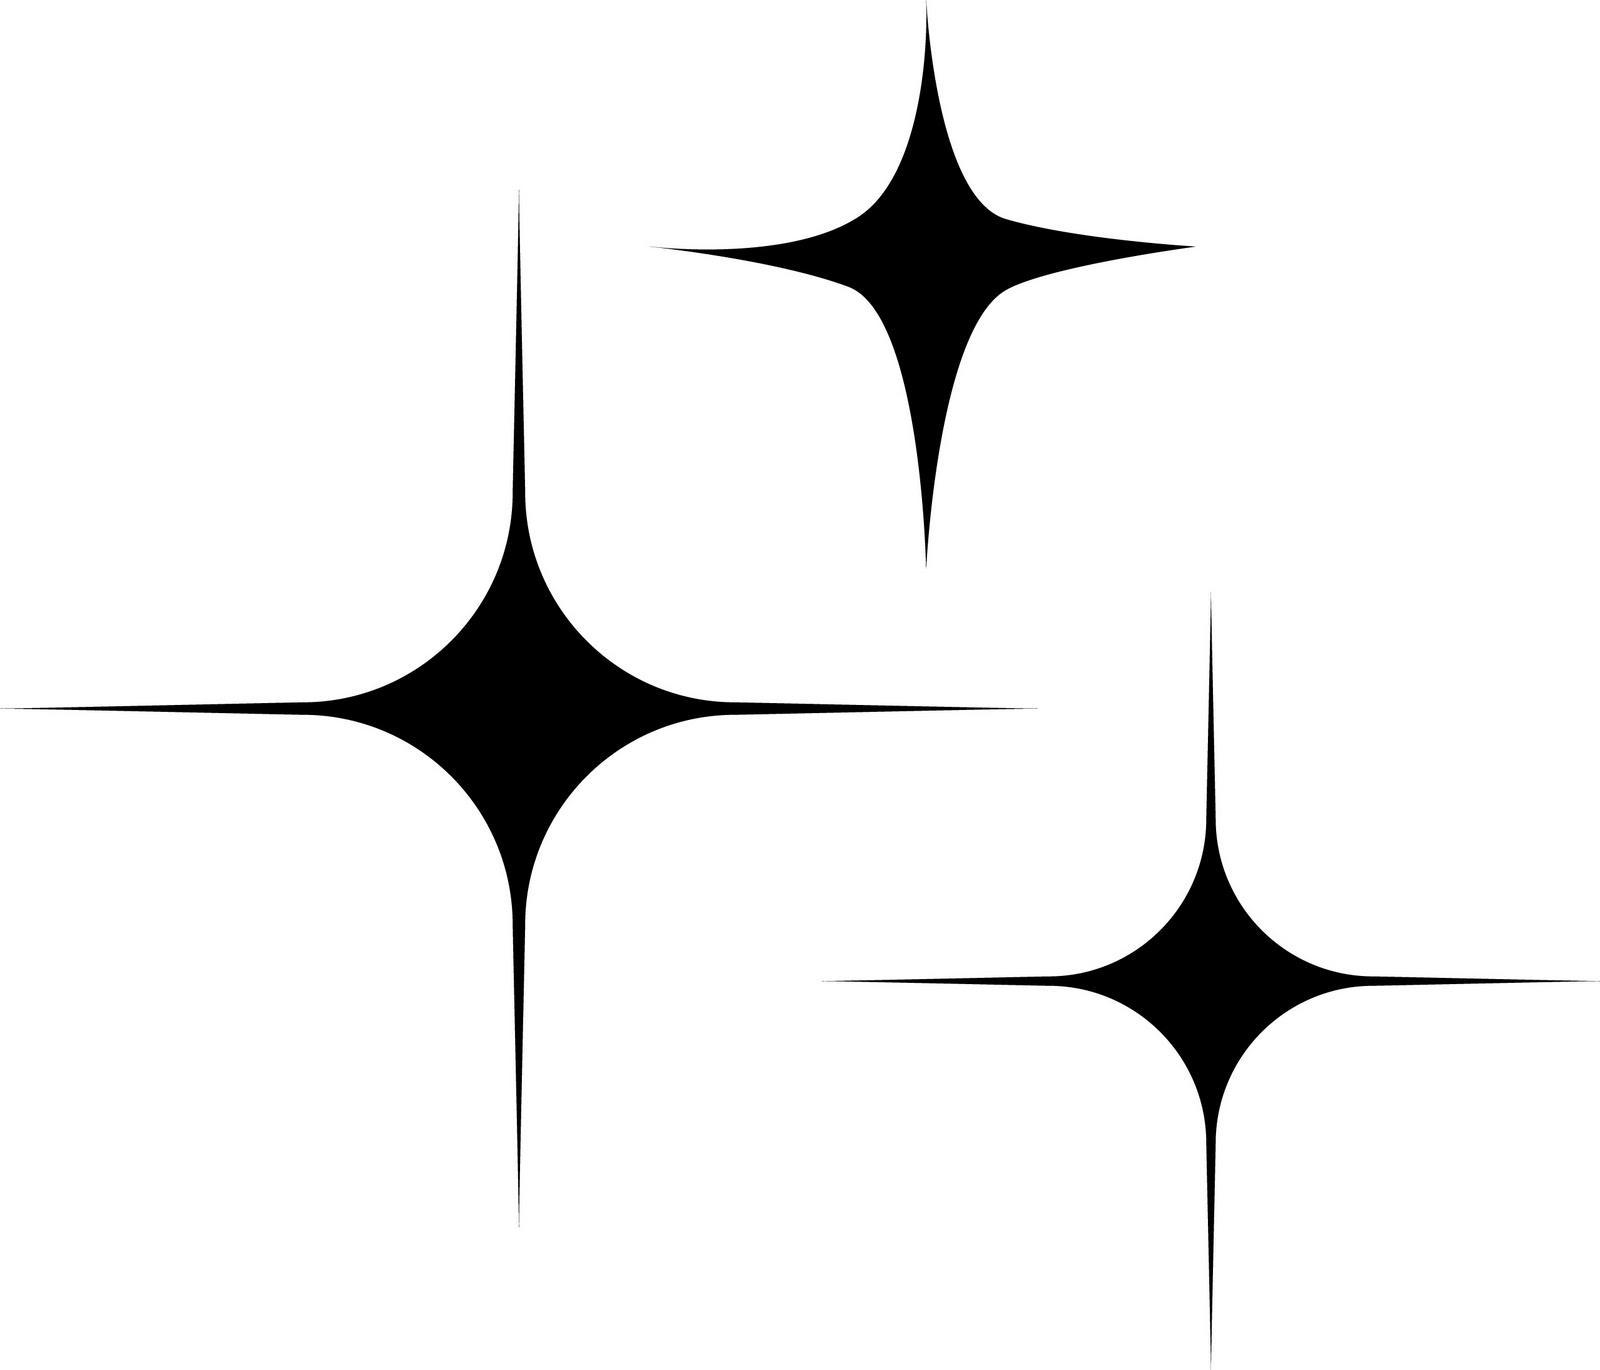 HD Sparkle Star Clip Art Design » Free Vector Art, Images.